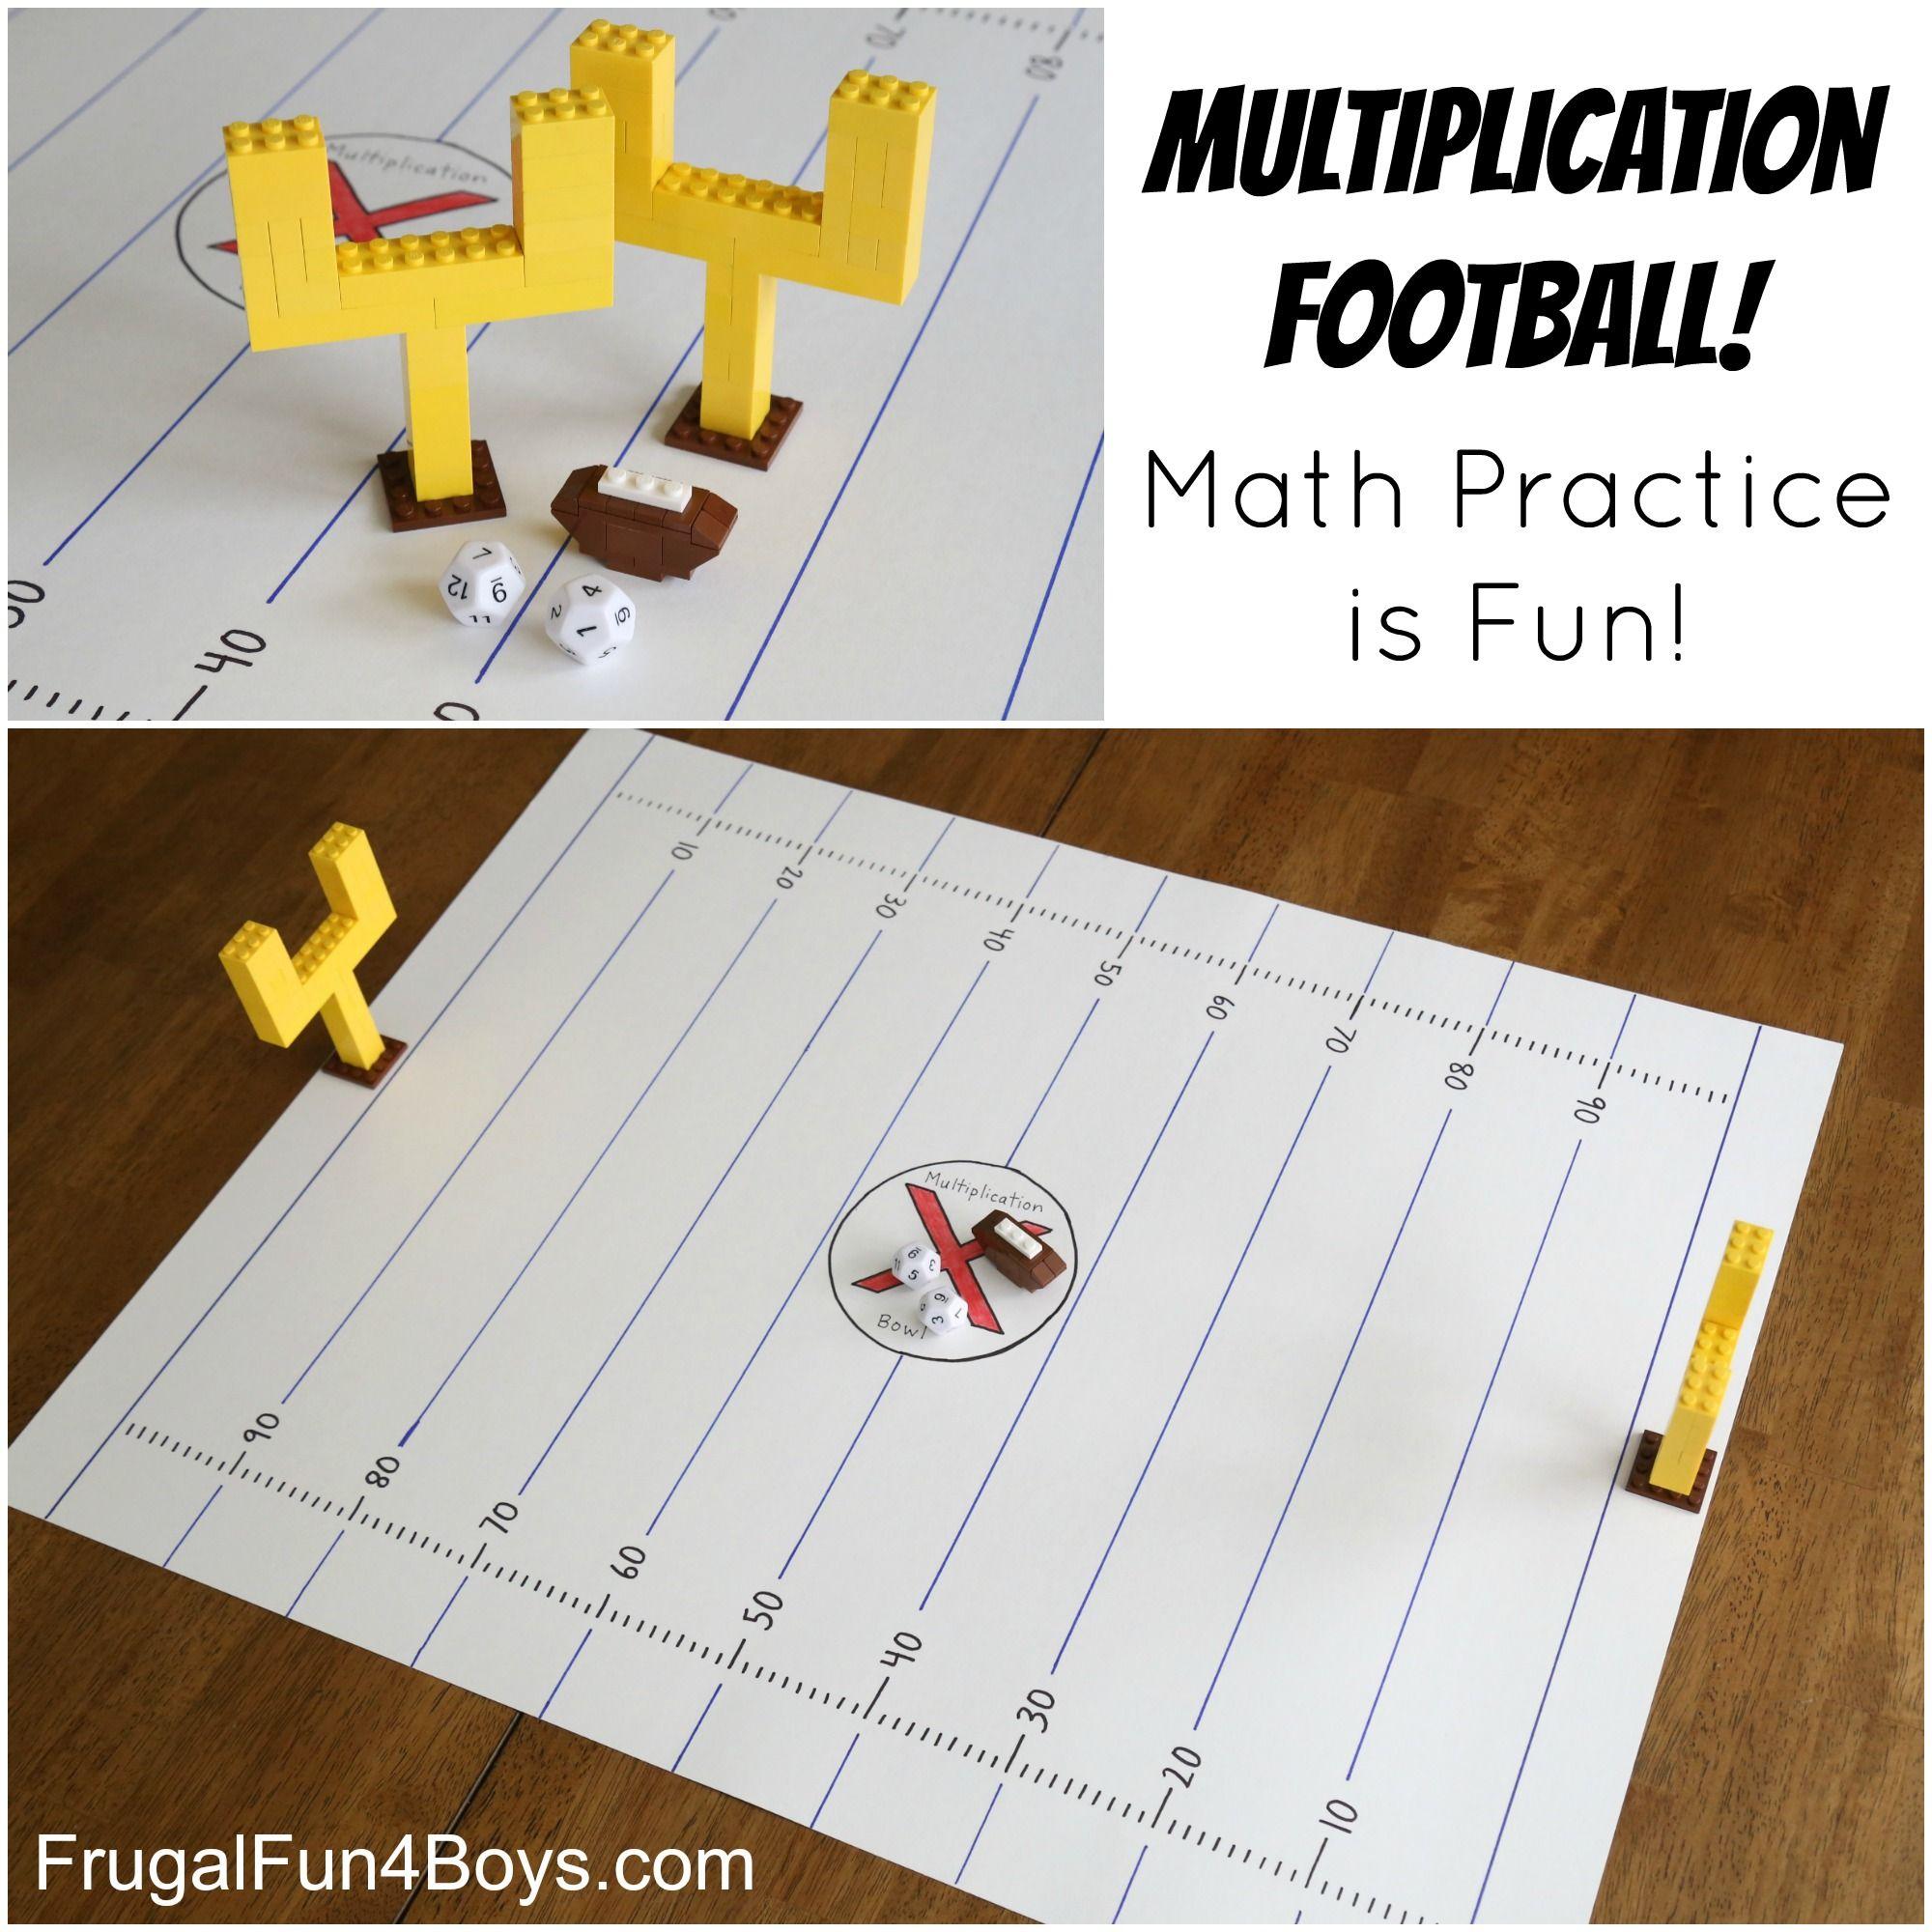 Multiplication Football Game Make Math Fact Practice Fun